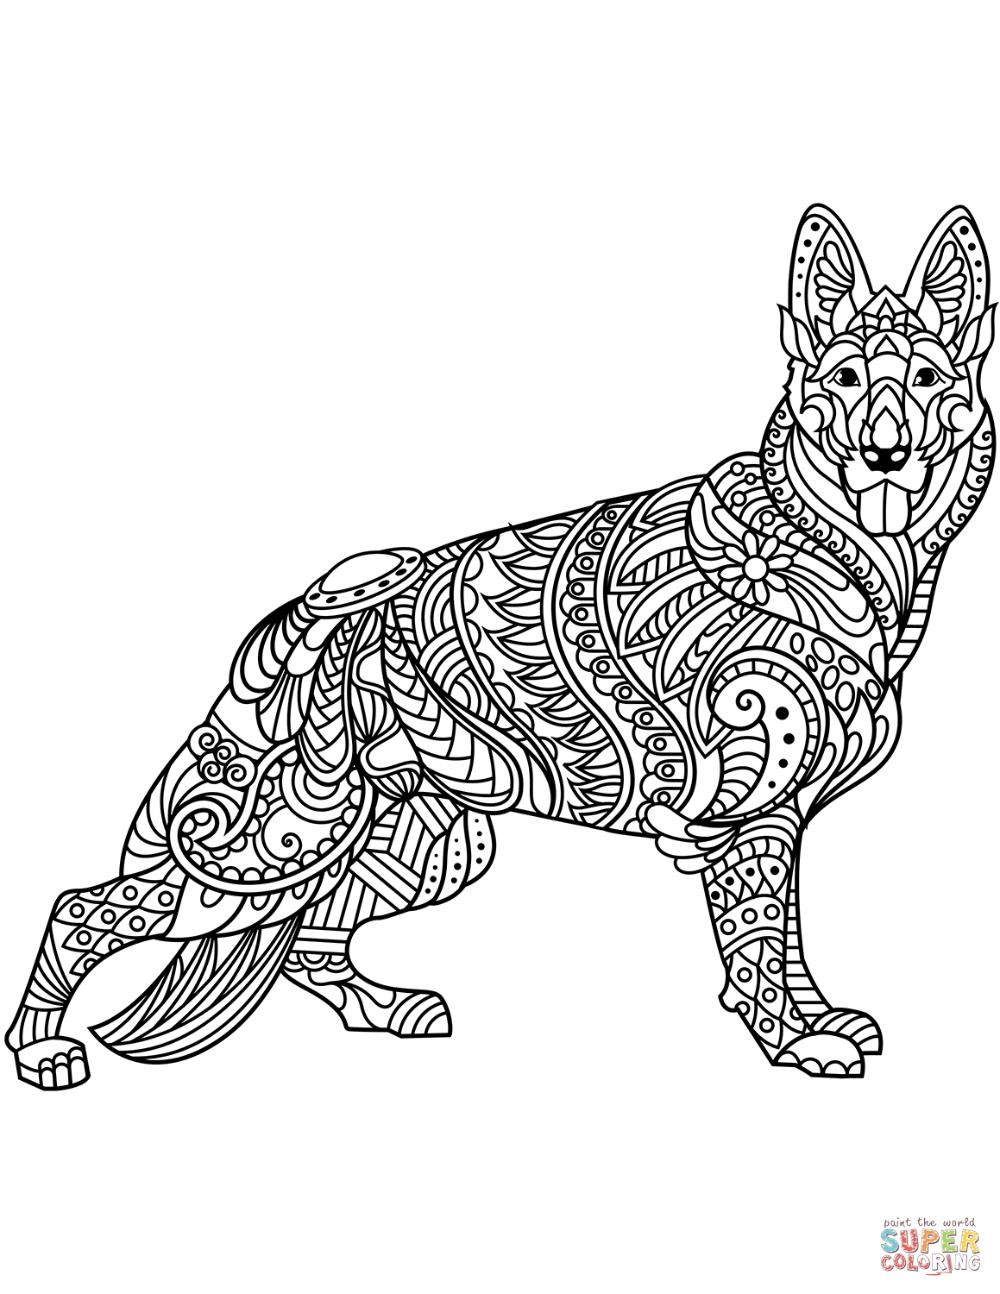 German Shepherd Zentangle Coloring Page Free Printable Coloring Pages In 2020 Dog Coloring Page Horse Coloring Pages Animal Coloring Books